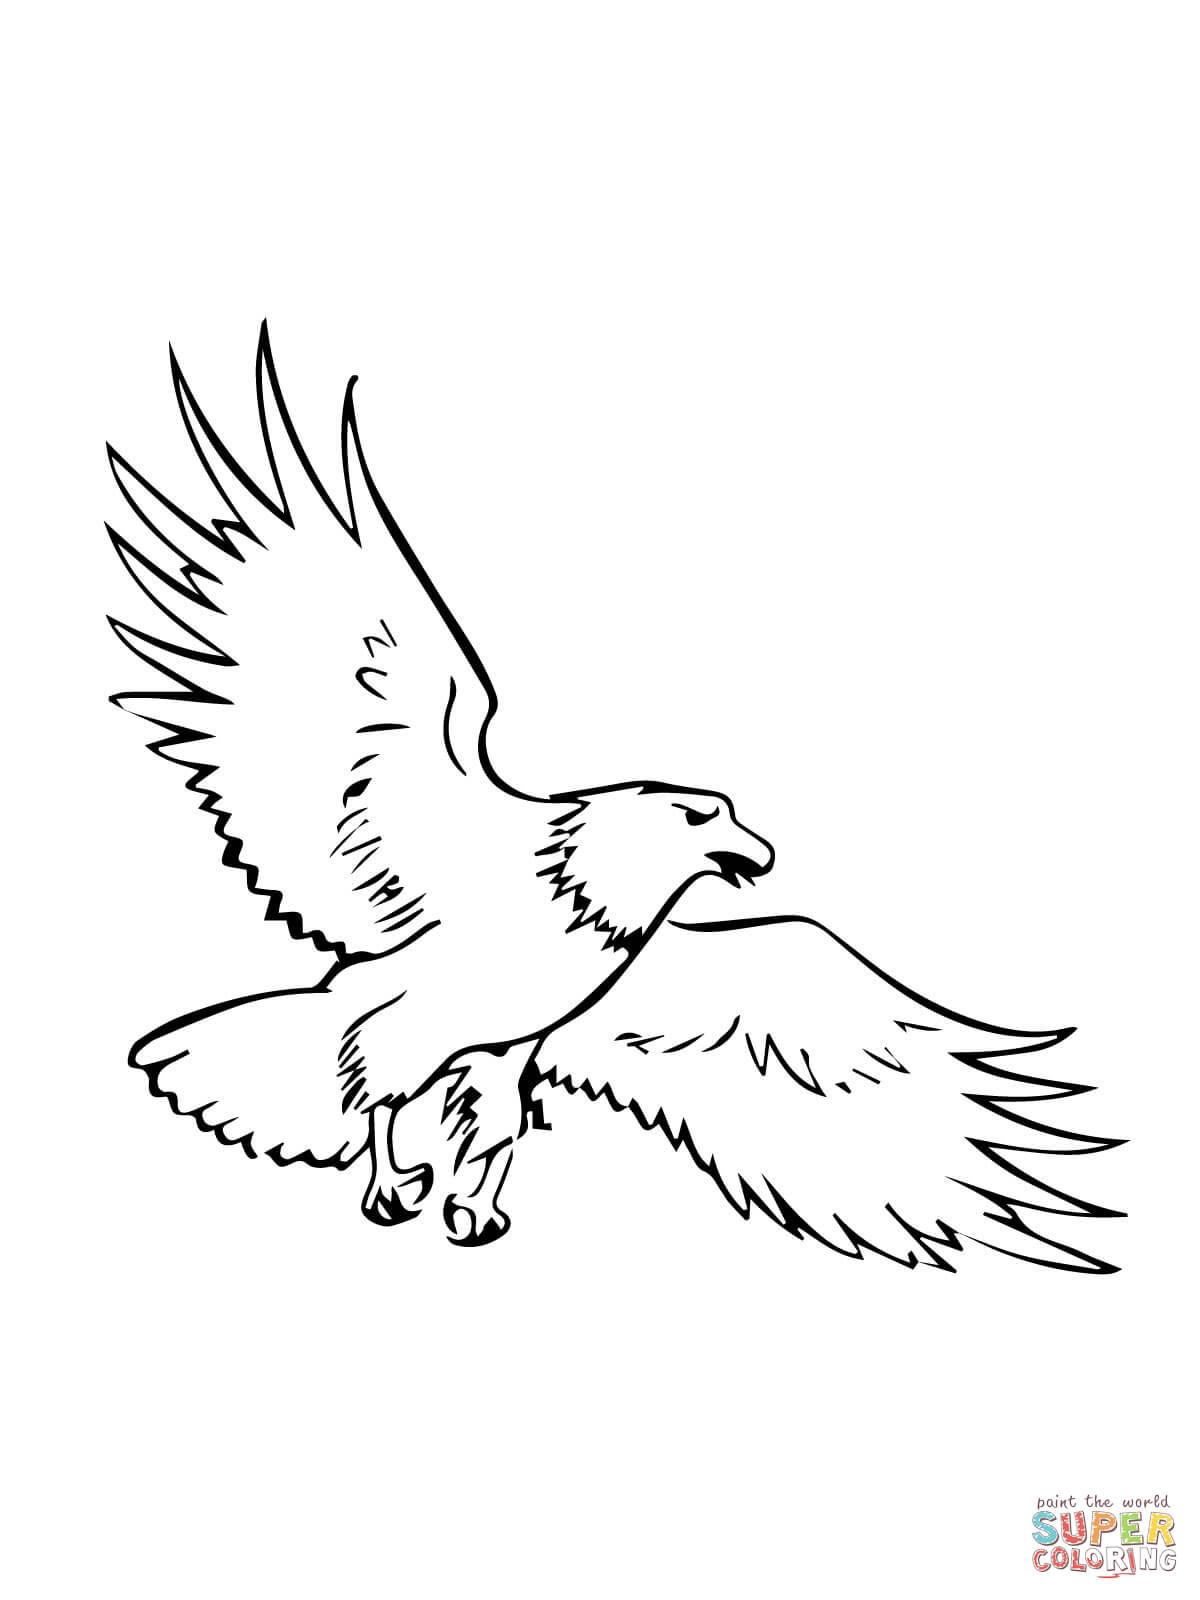 Soaring Bald Eagle Coloring Page